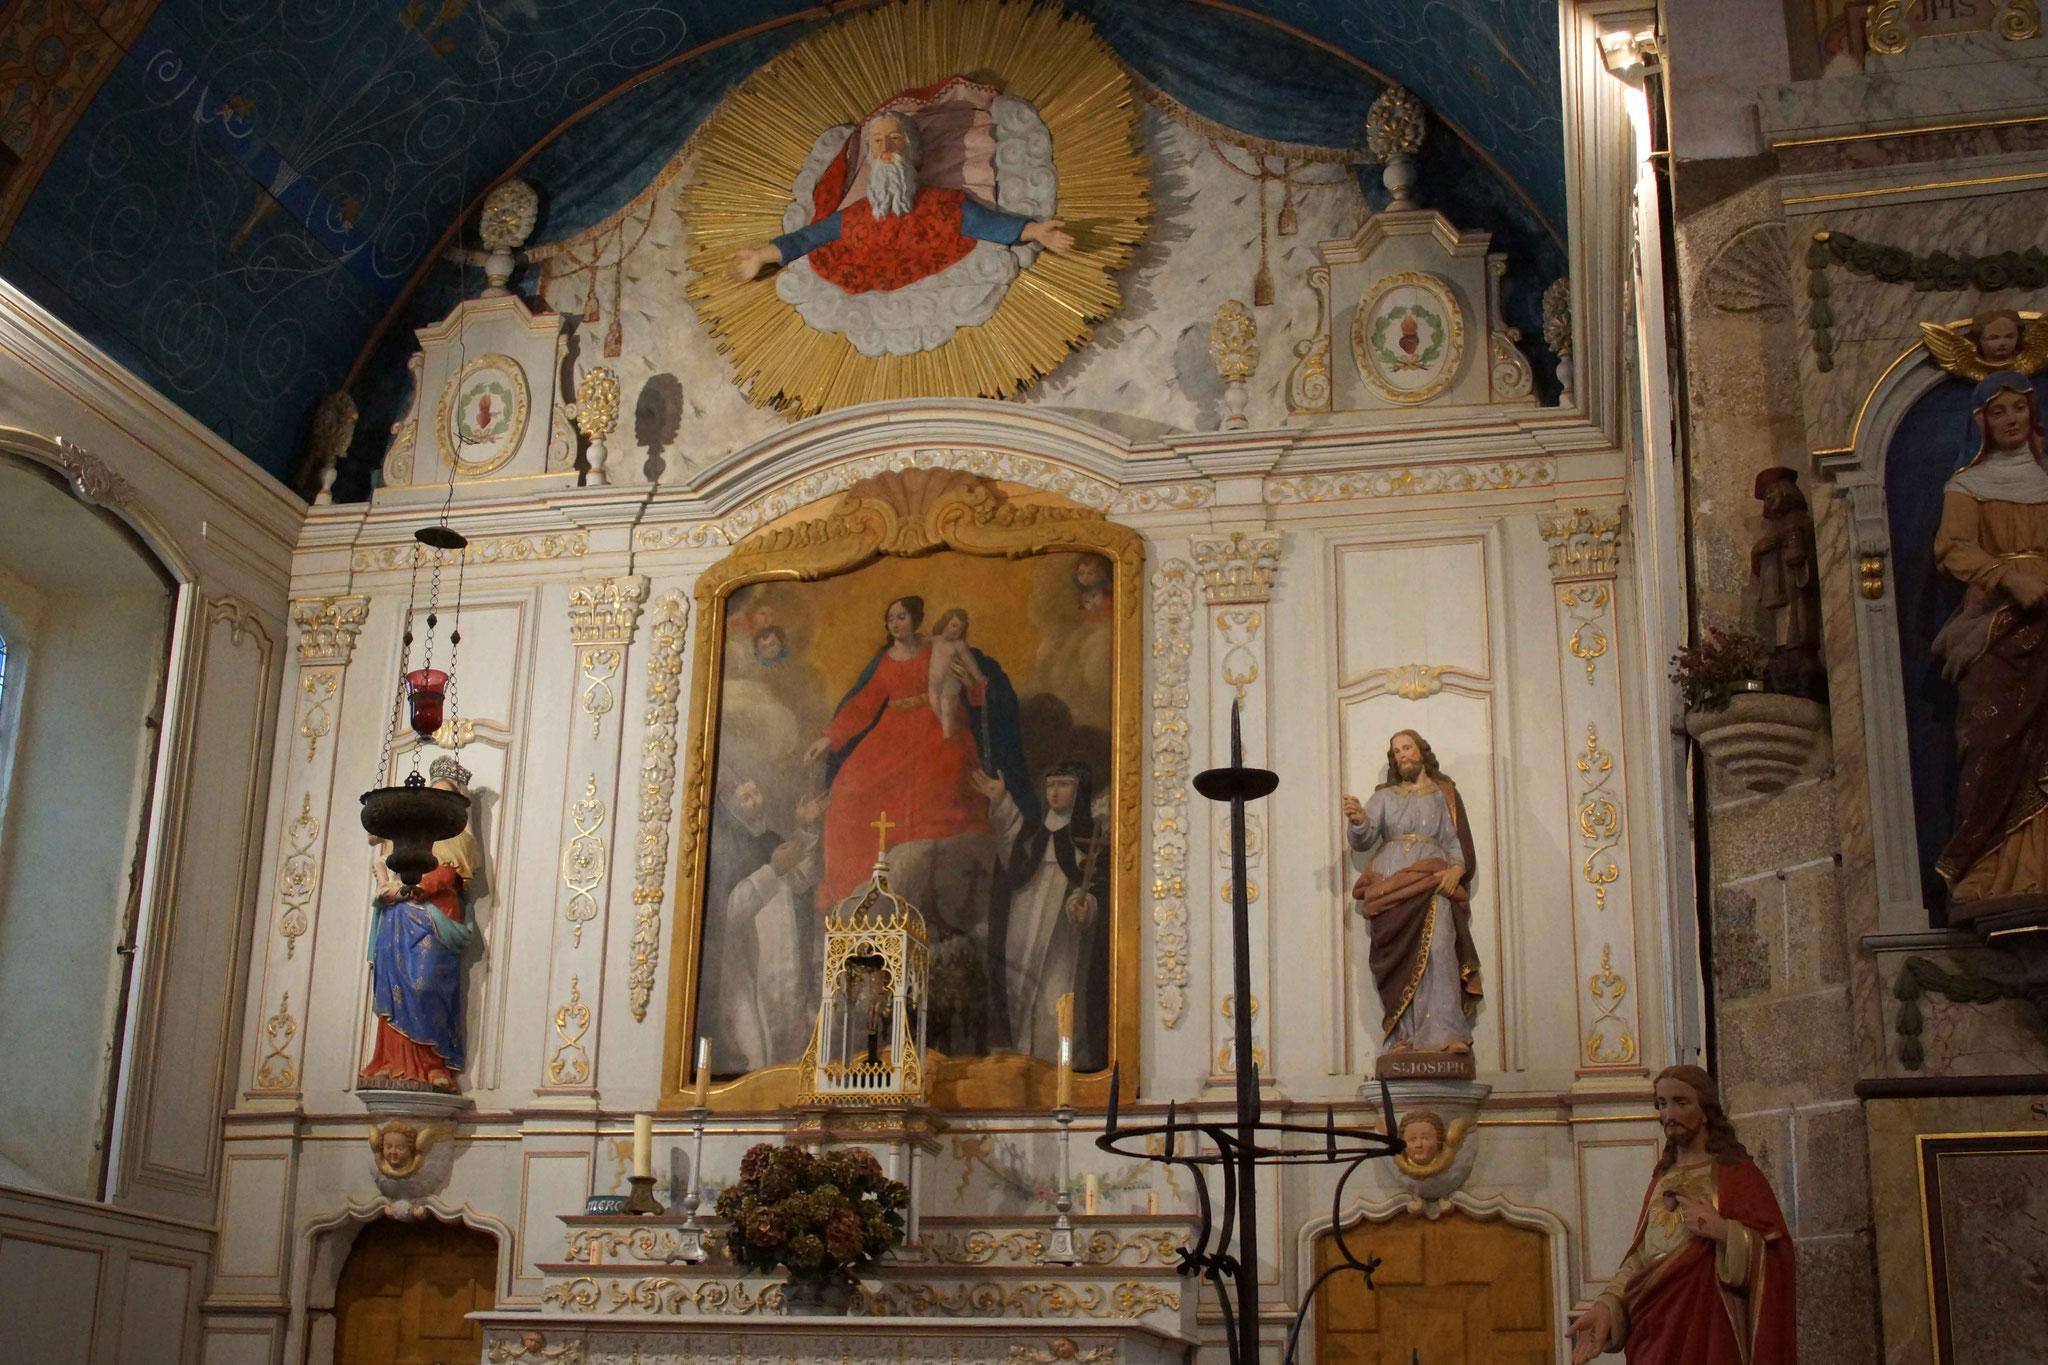 Chapelle de Liscorno, à Lannebert 7